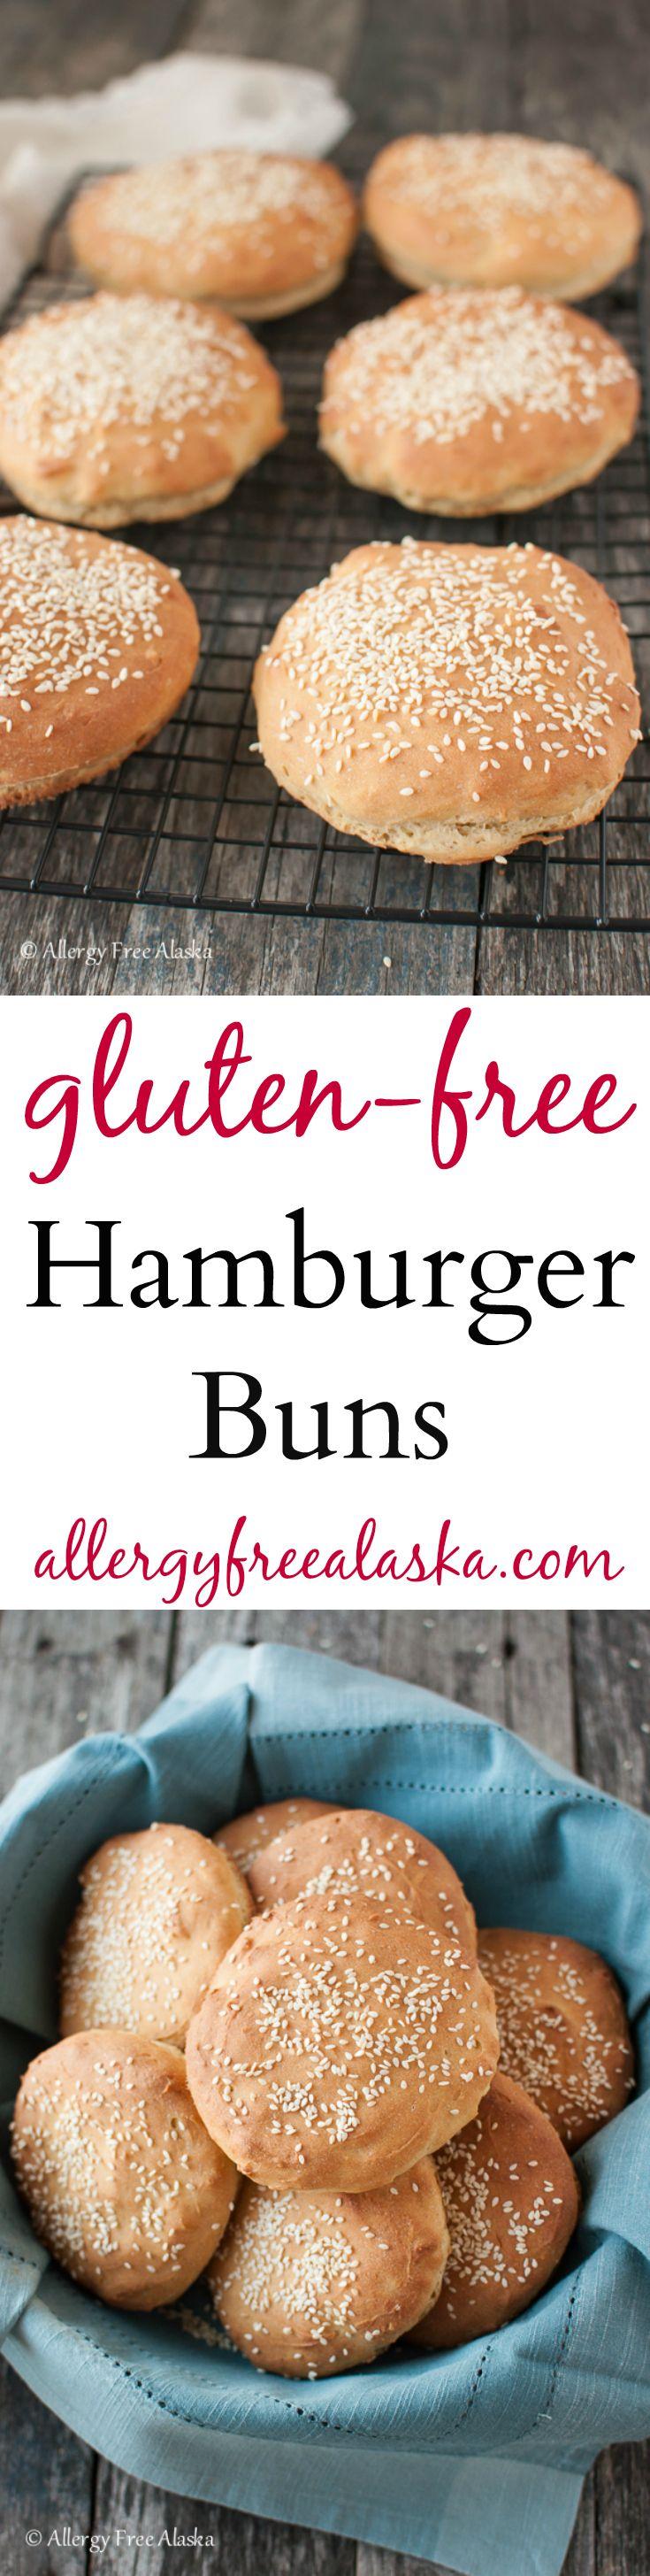 Gluten-Free Hamburger Buns Recipe from Allergy Free Alaska